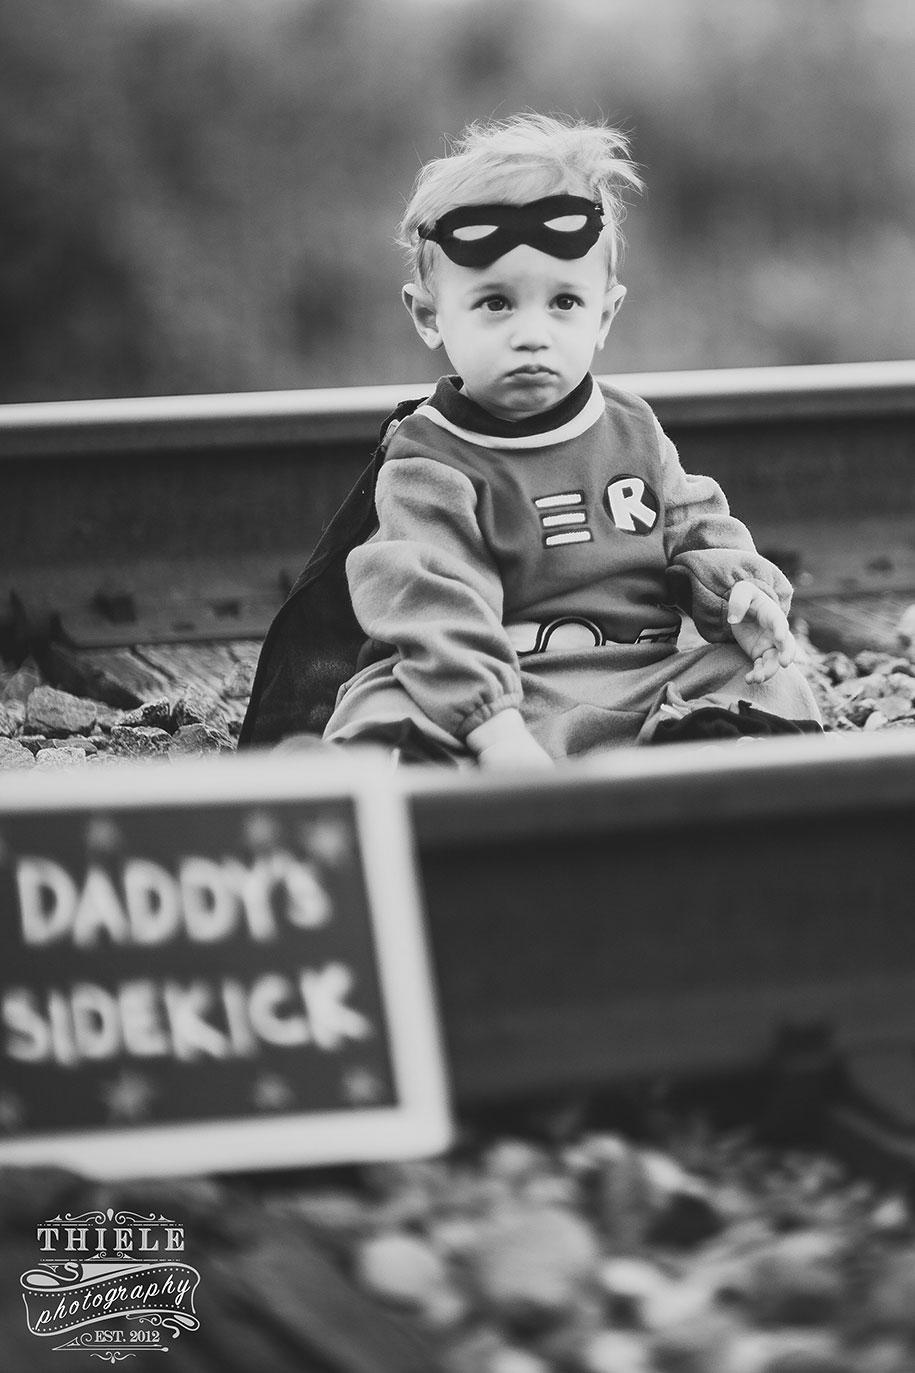 father-son-surprise-batman-robin-photoshoot-eric-thiele-20